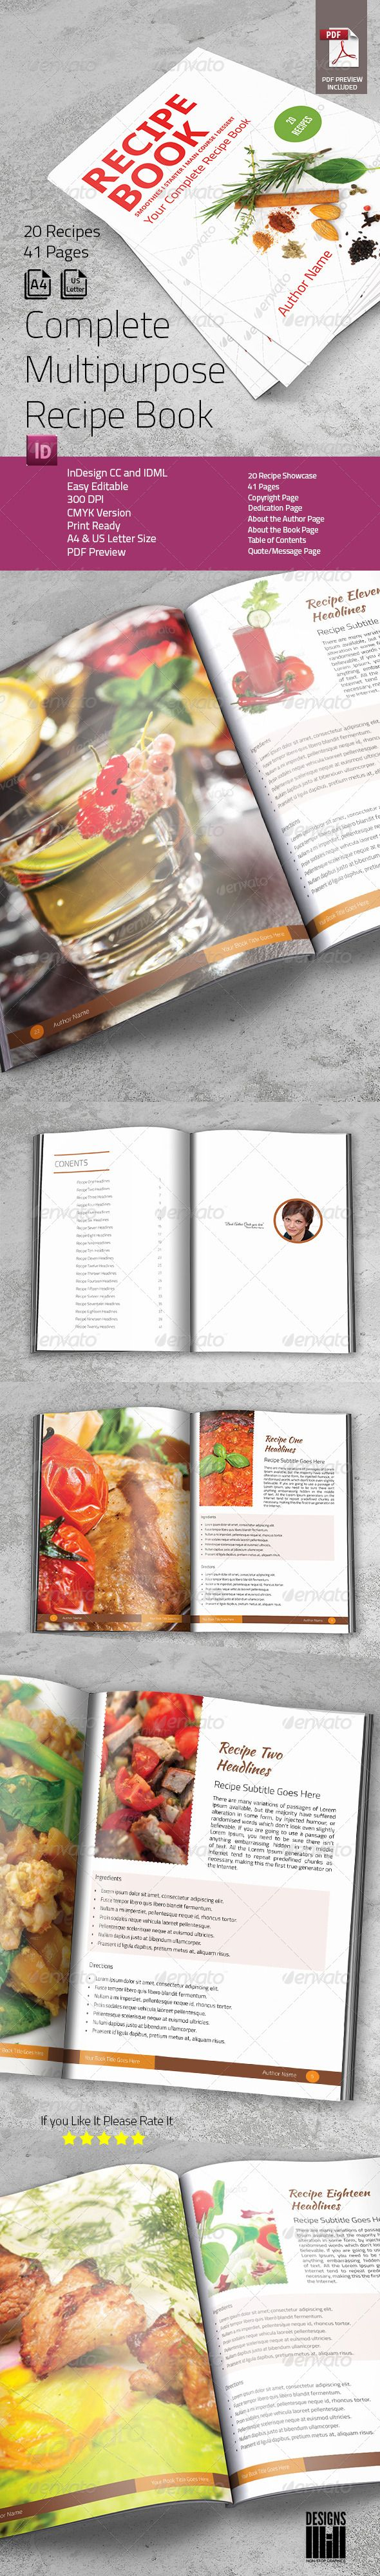 Complete Recipe Book Informational Brochures Complete Recipe